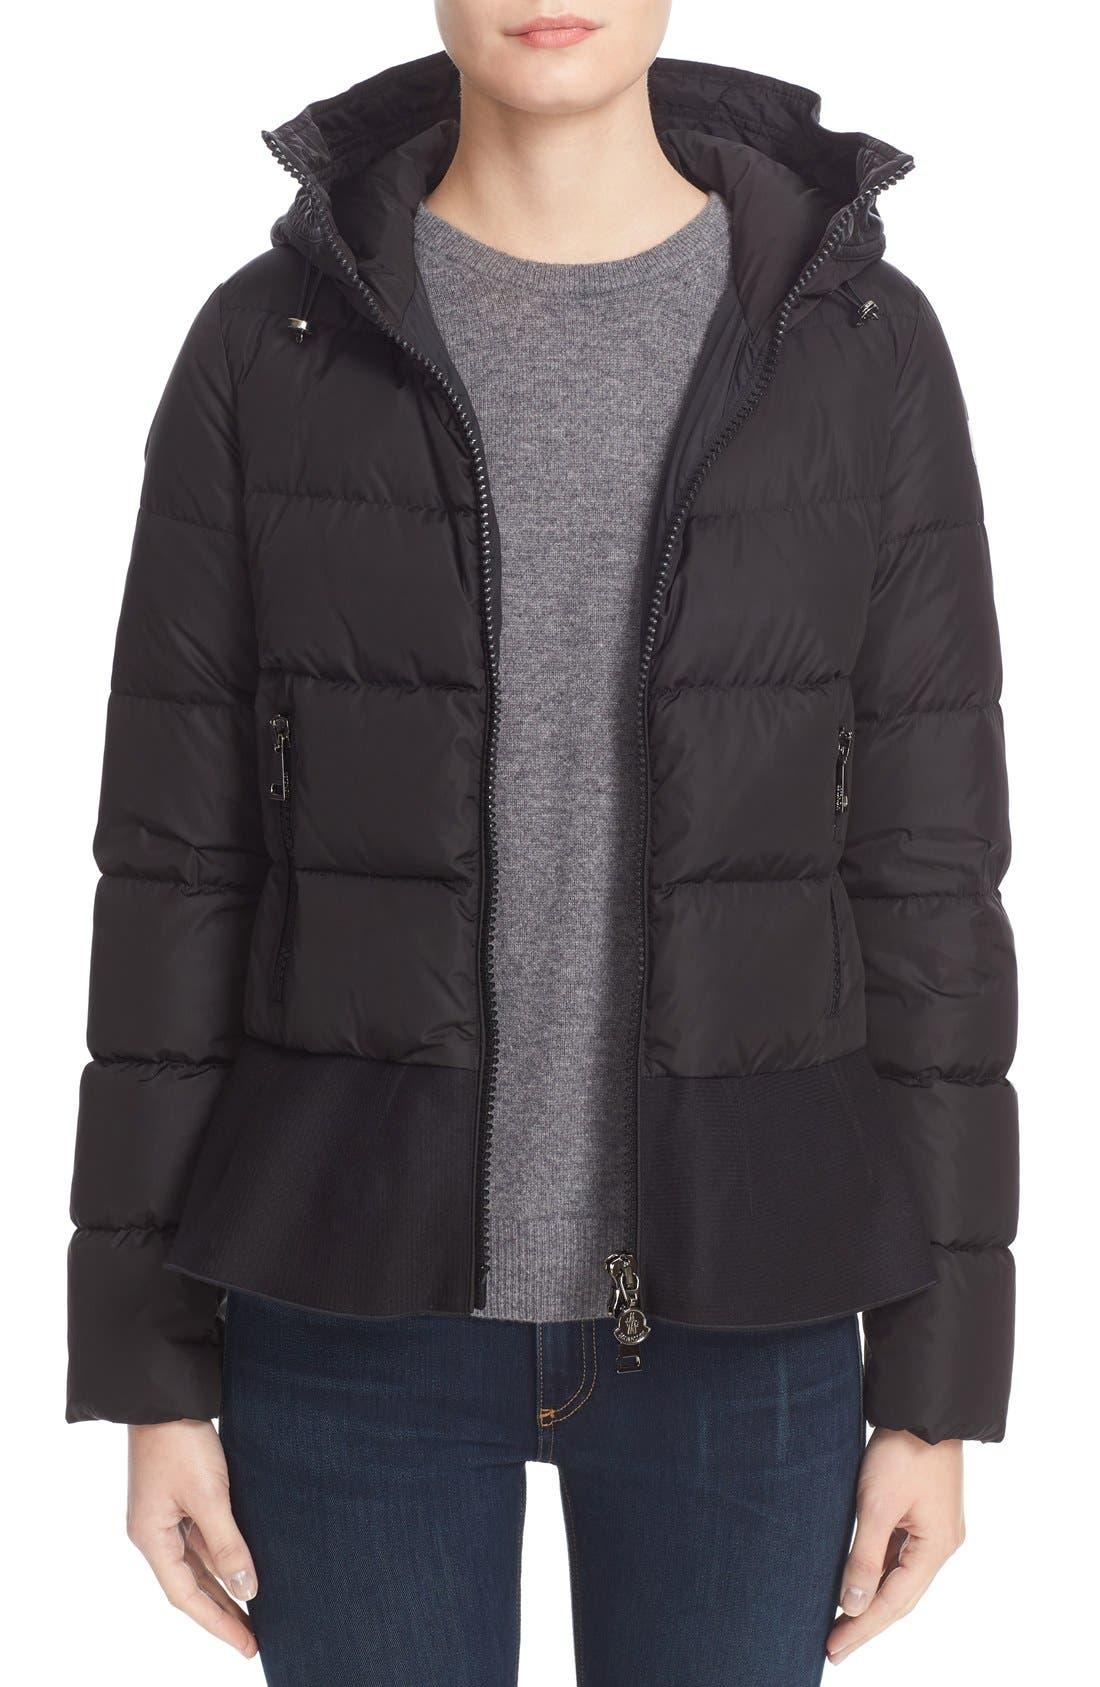 Nesea Peplum Hem Down Puffer Jacket,                             Main thumbnail 1, color,                             Black